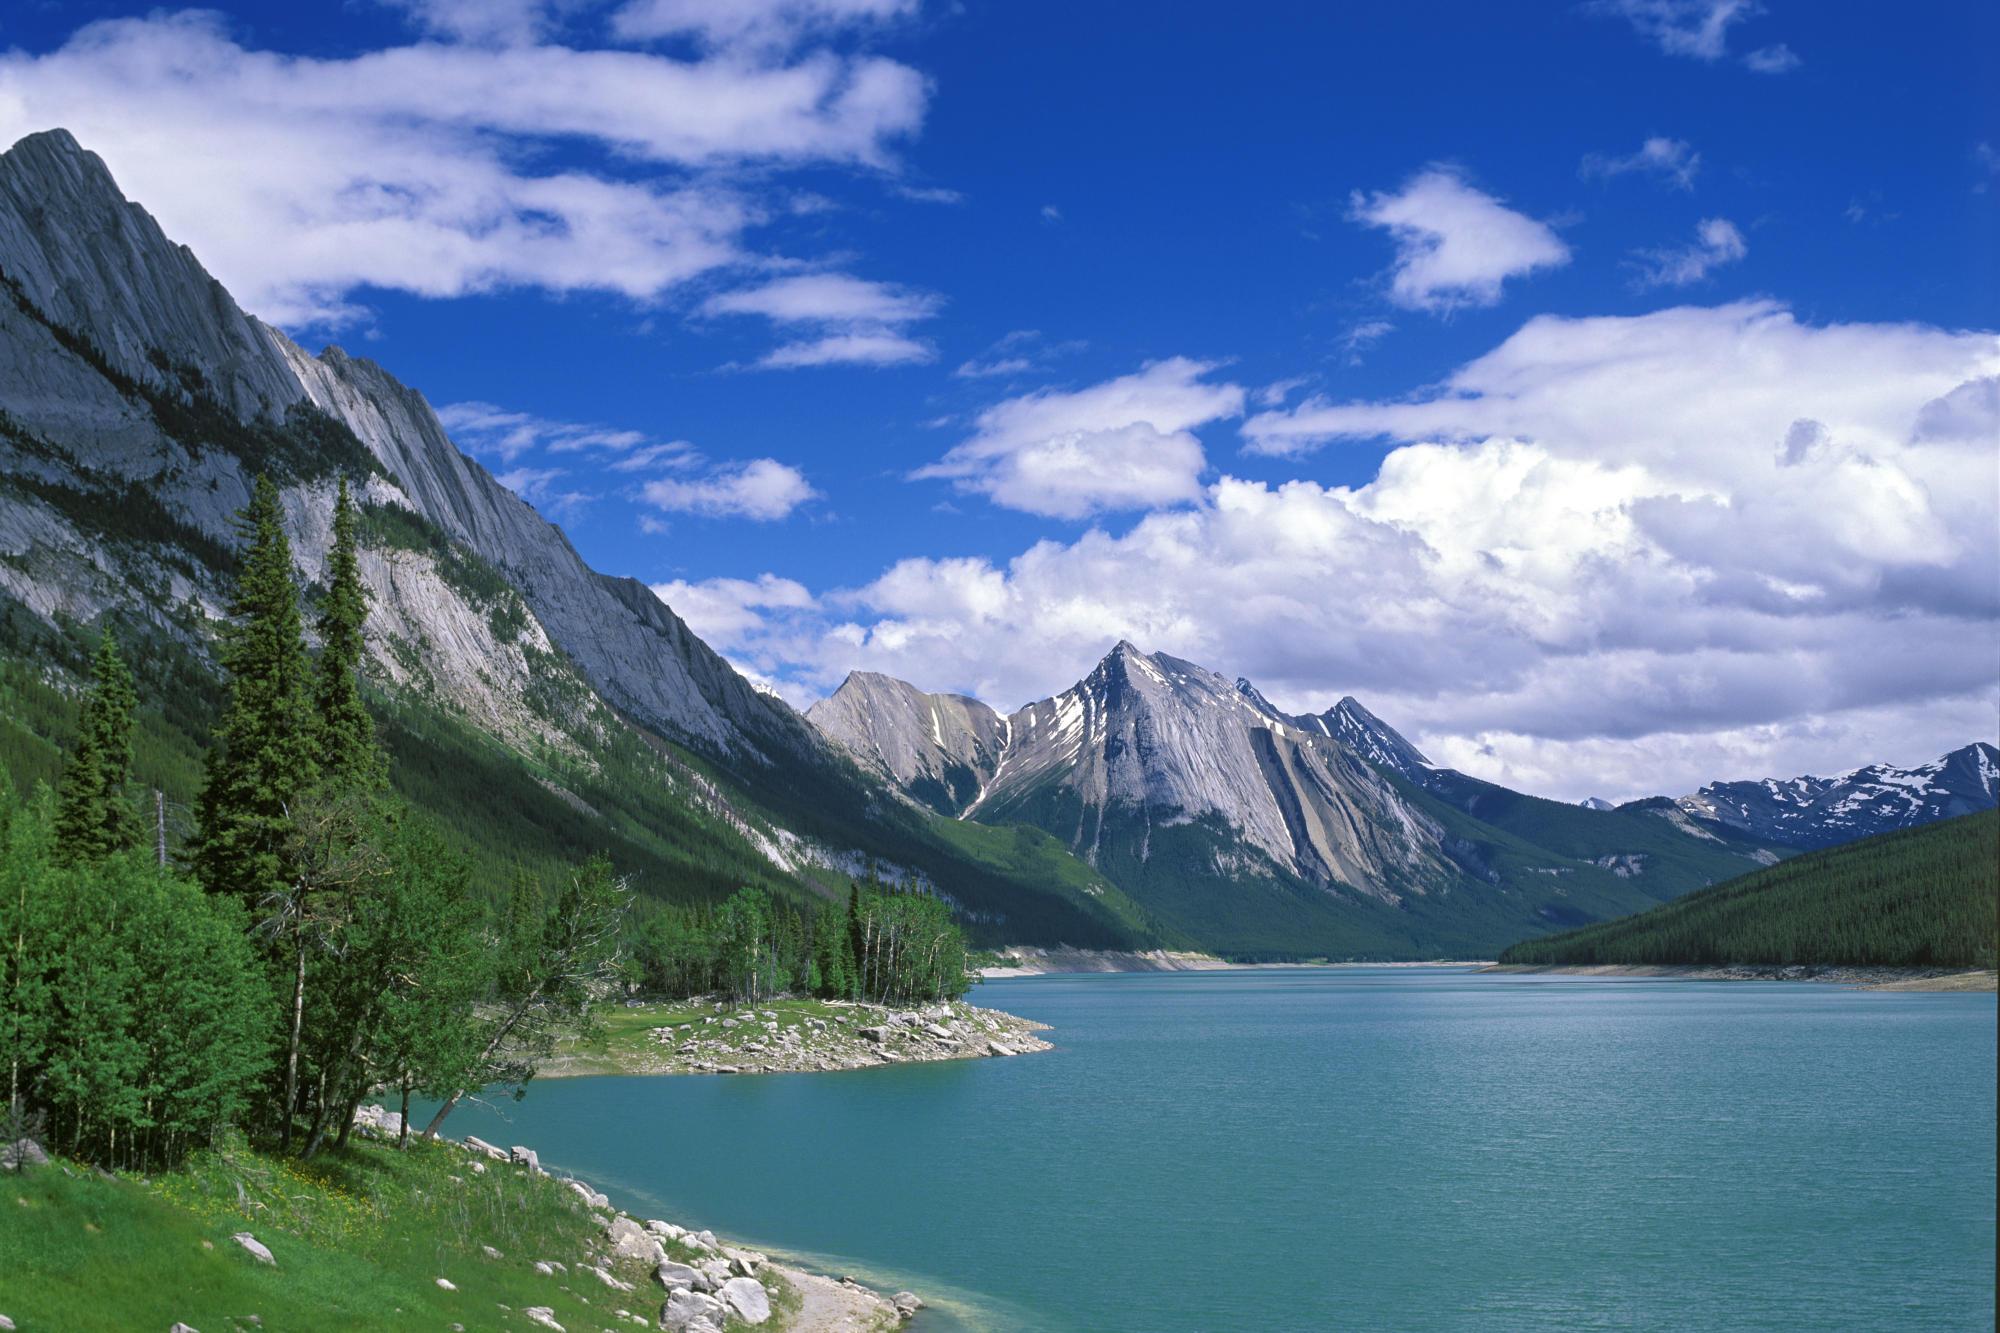 nationalpark alberta kanada - photo #18